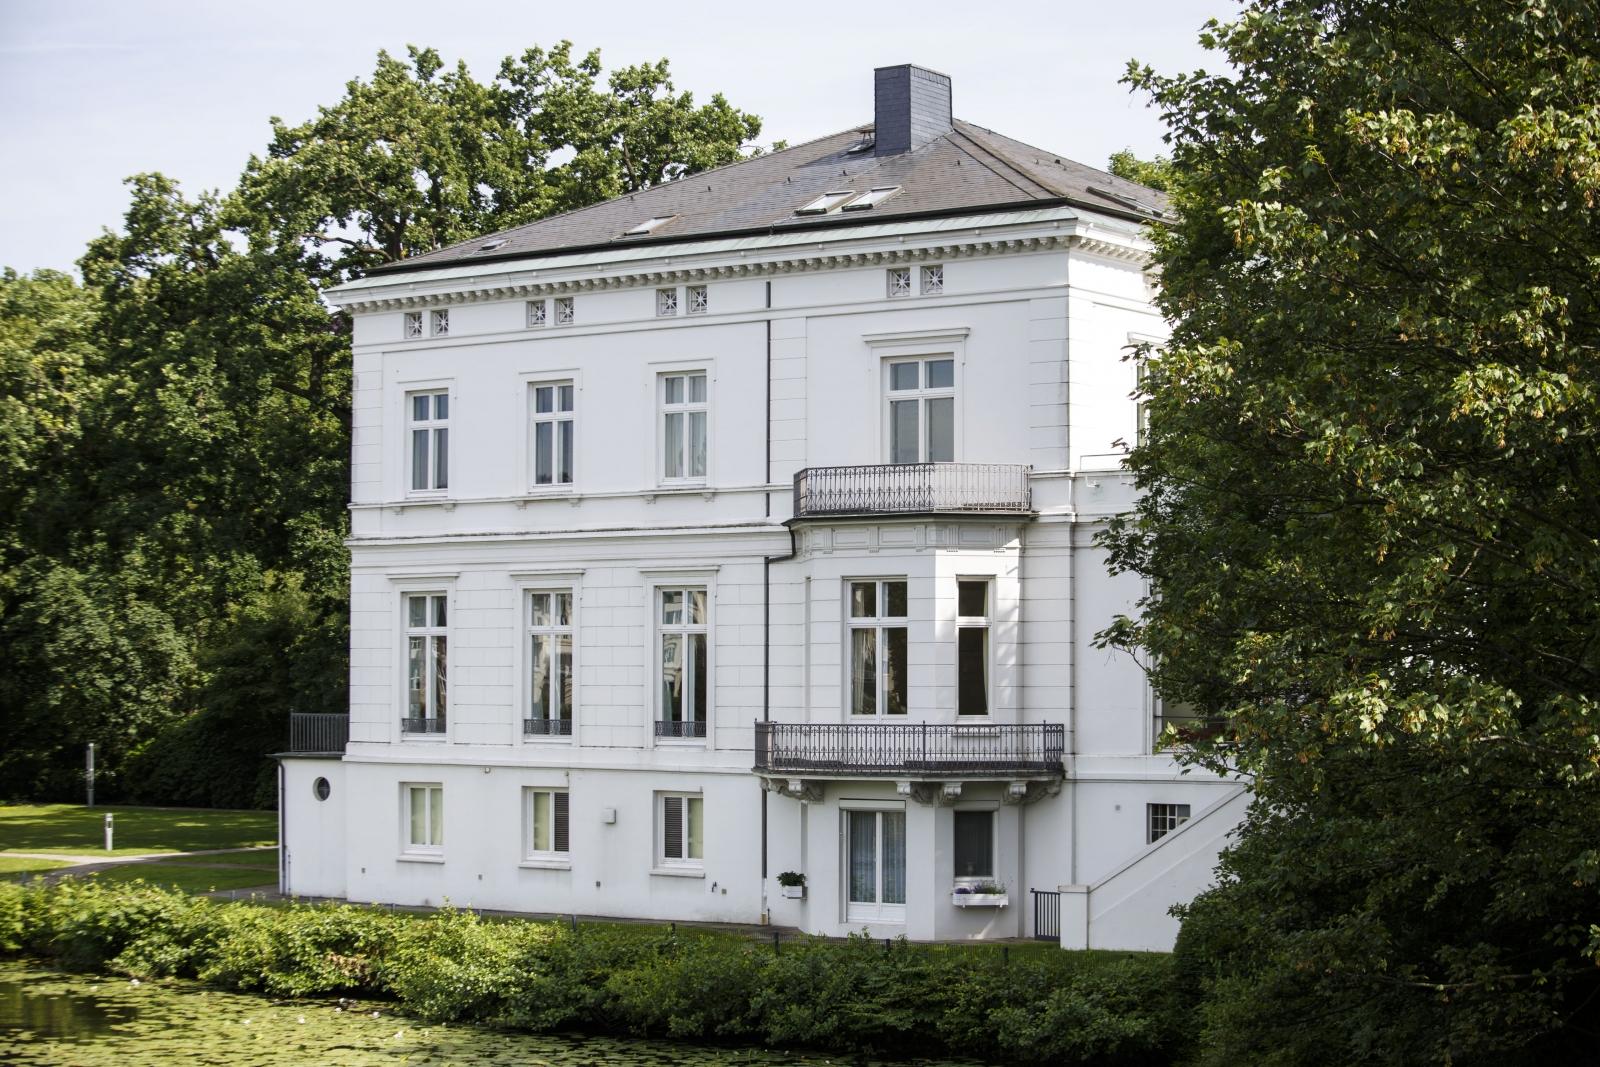 The guest house of the Hamburg senate